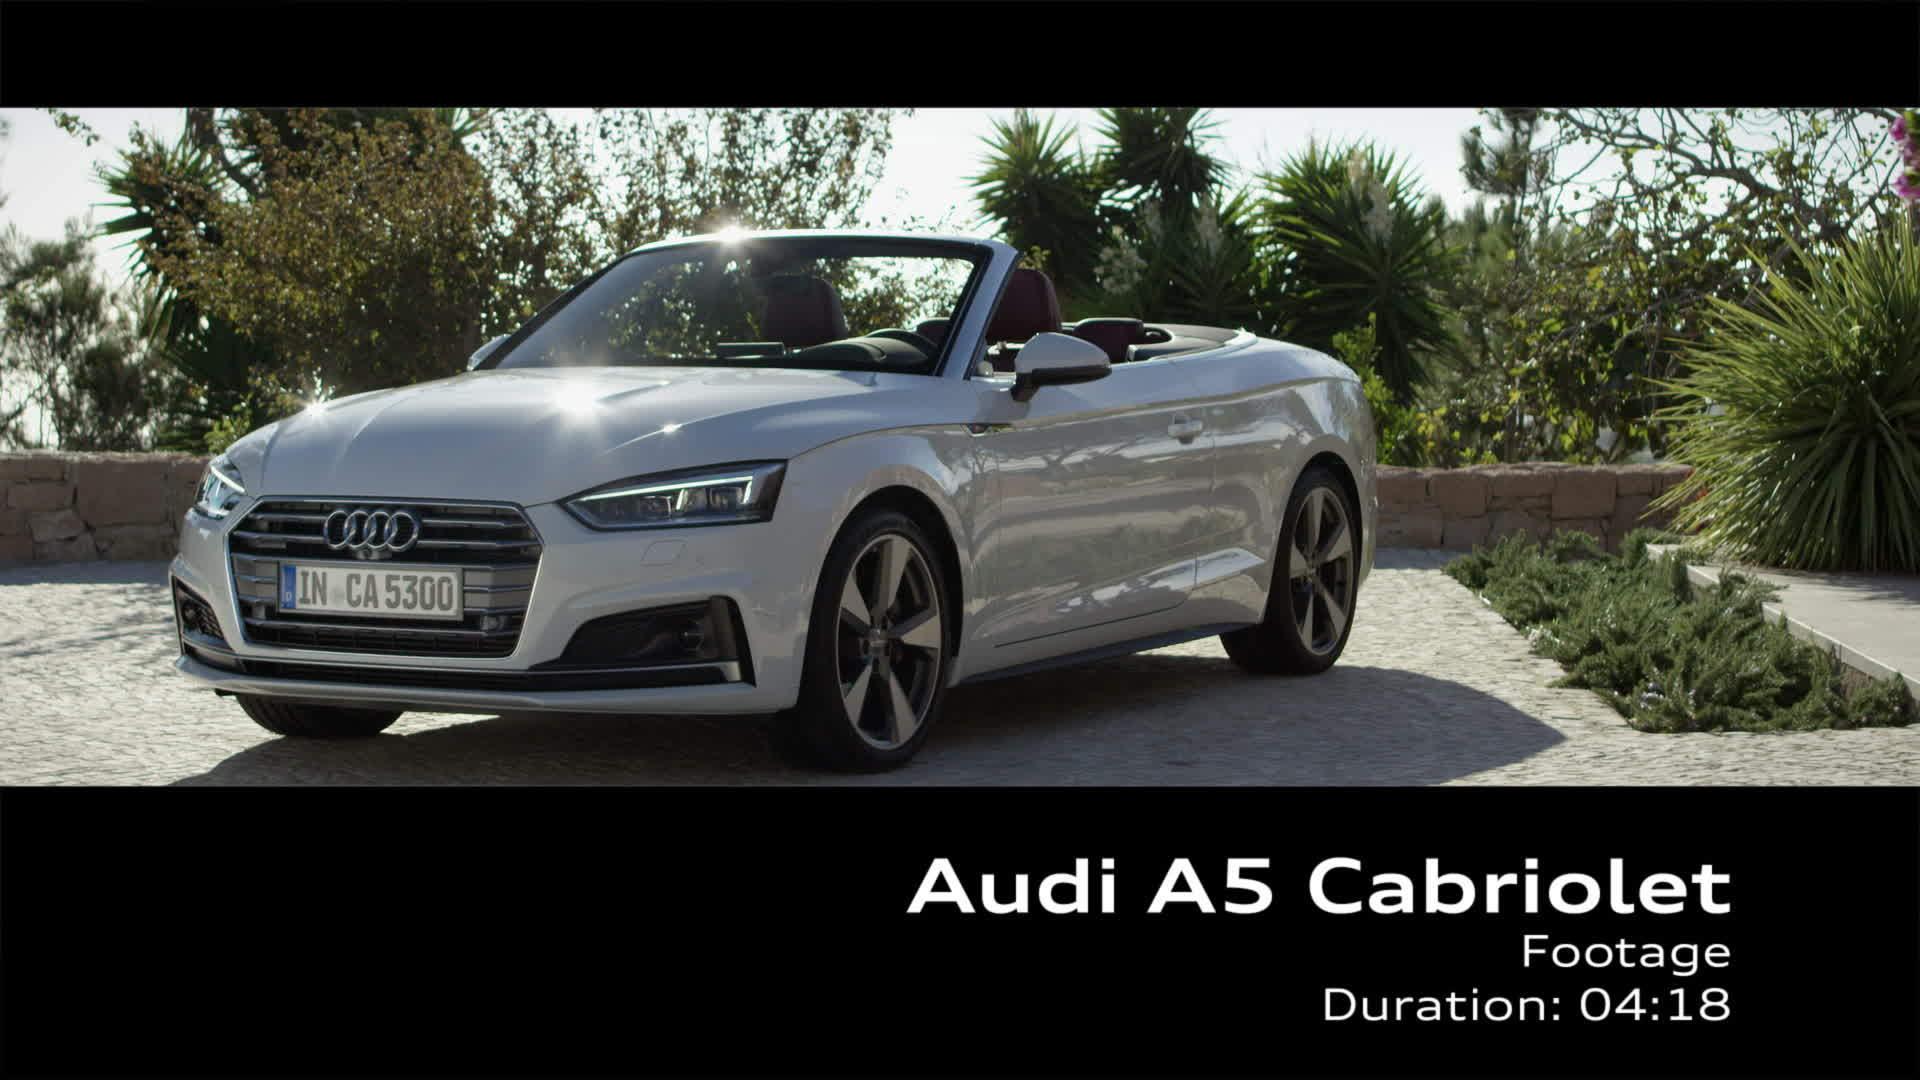 Audi A5 Cabriolet - Footage